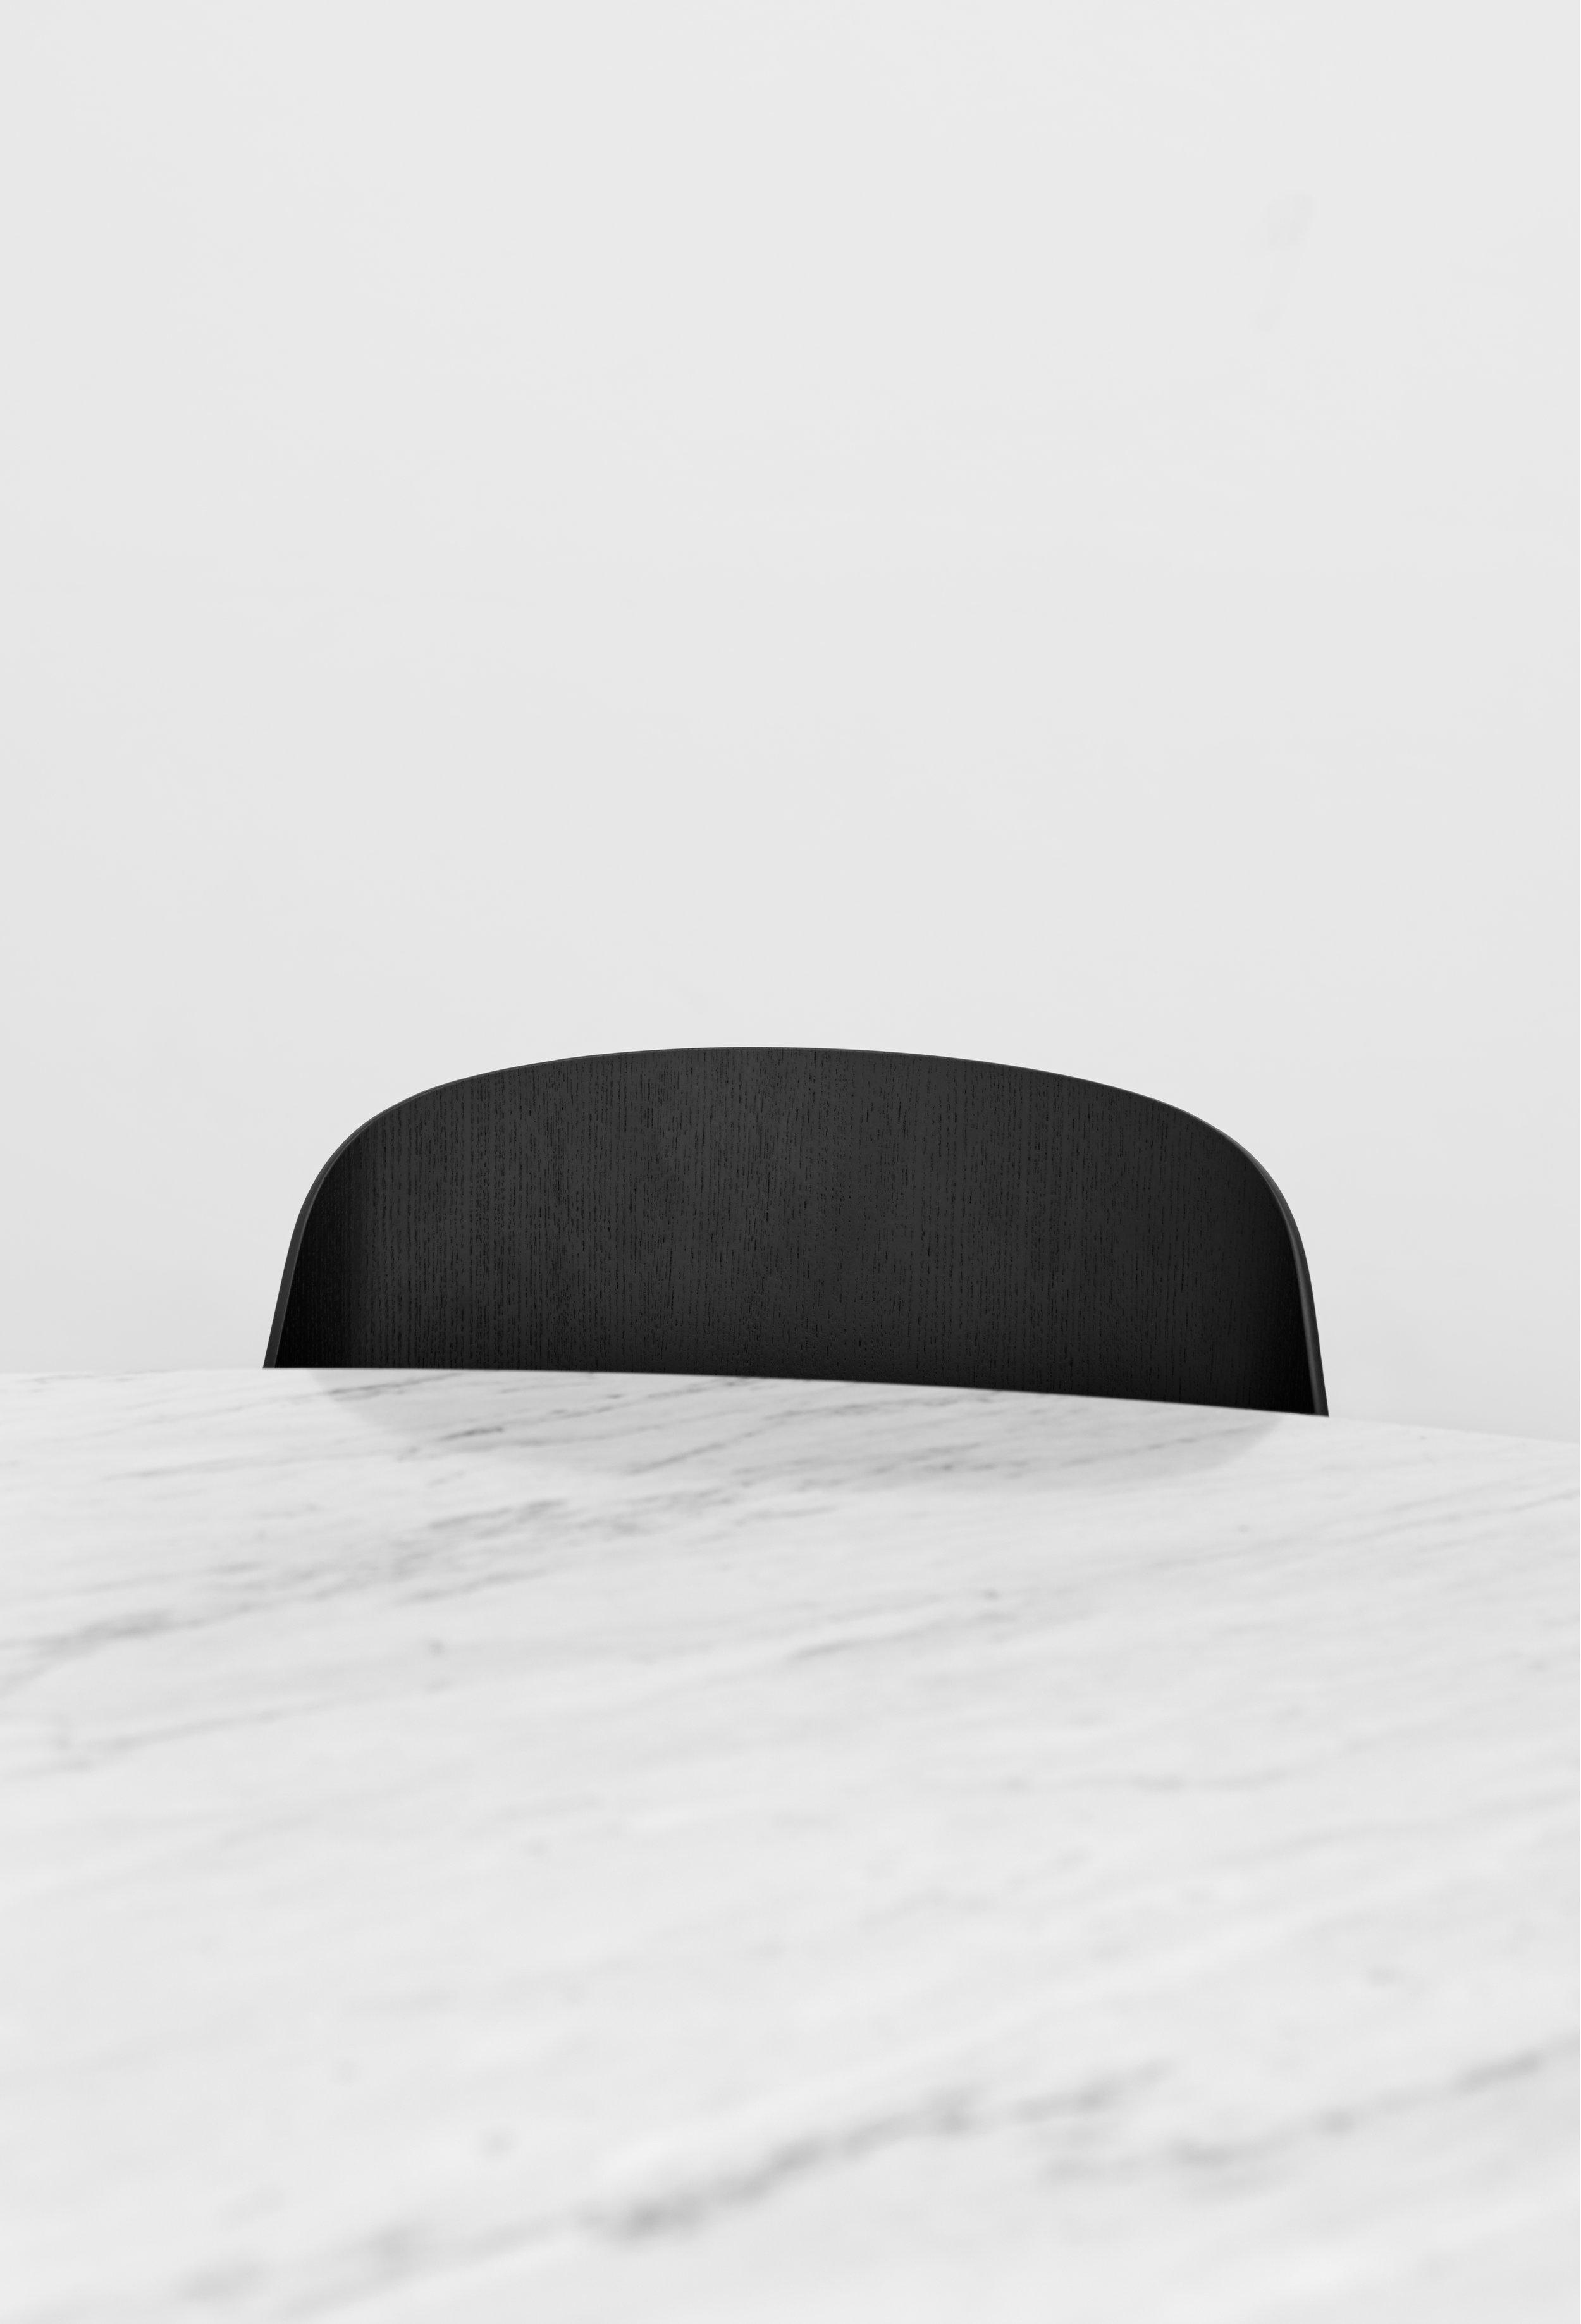 synnes-chair-2015-falke-svatun(7)